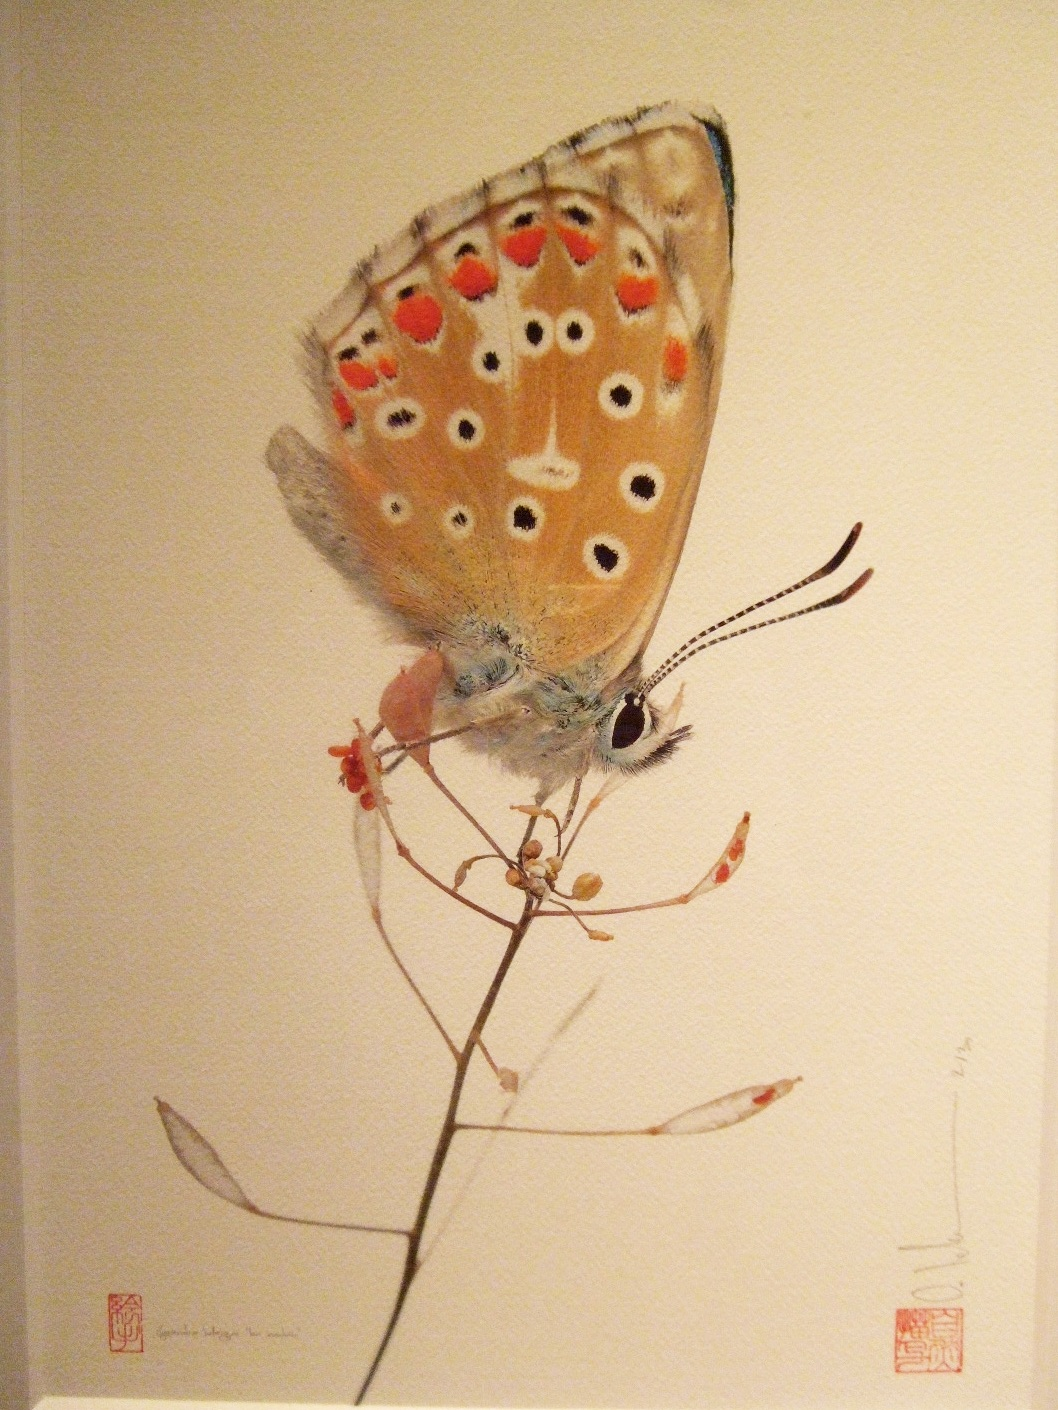 1063) af 「ステファン・エッテ写真展 『蝶の夢』」 終了・7月7日(火)~8月8日(土) _f0126829_13335778.jpg